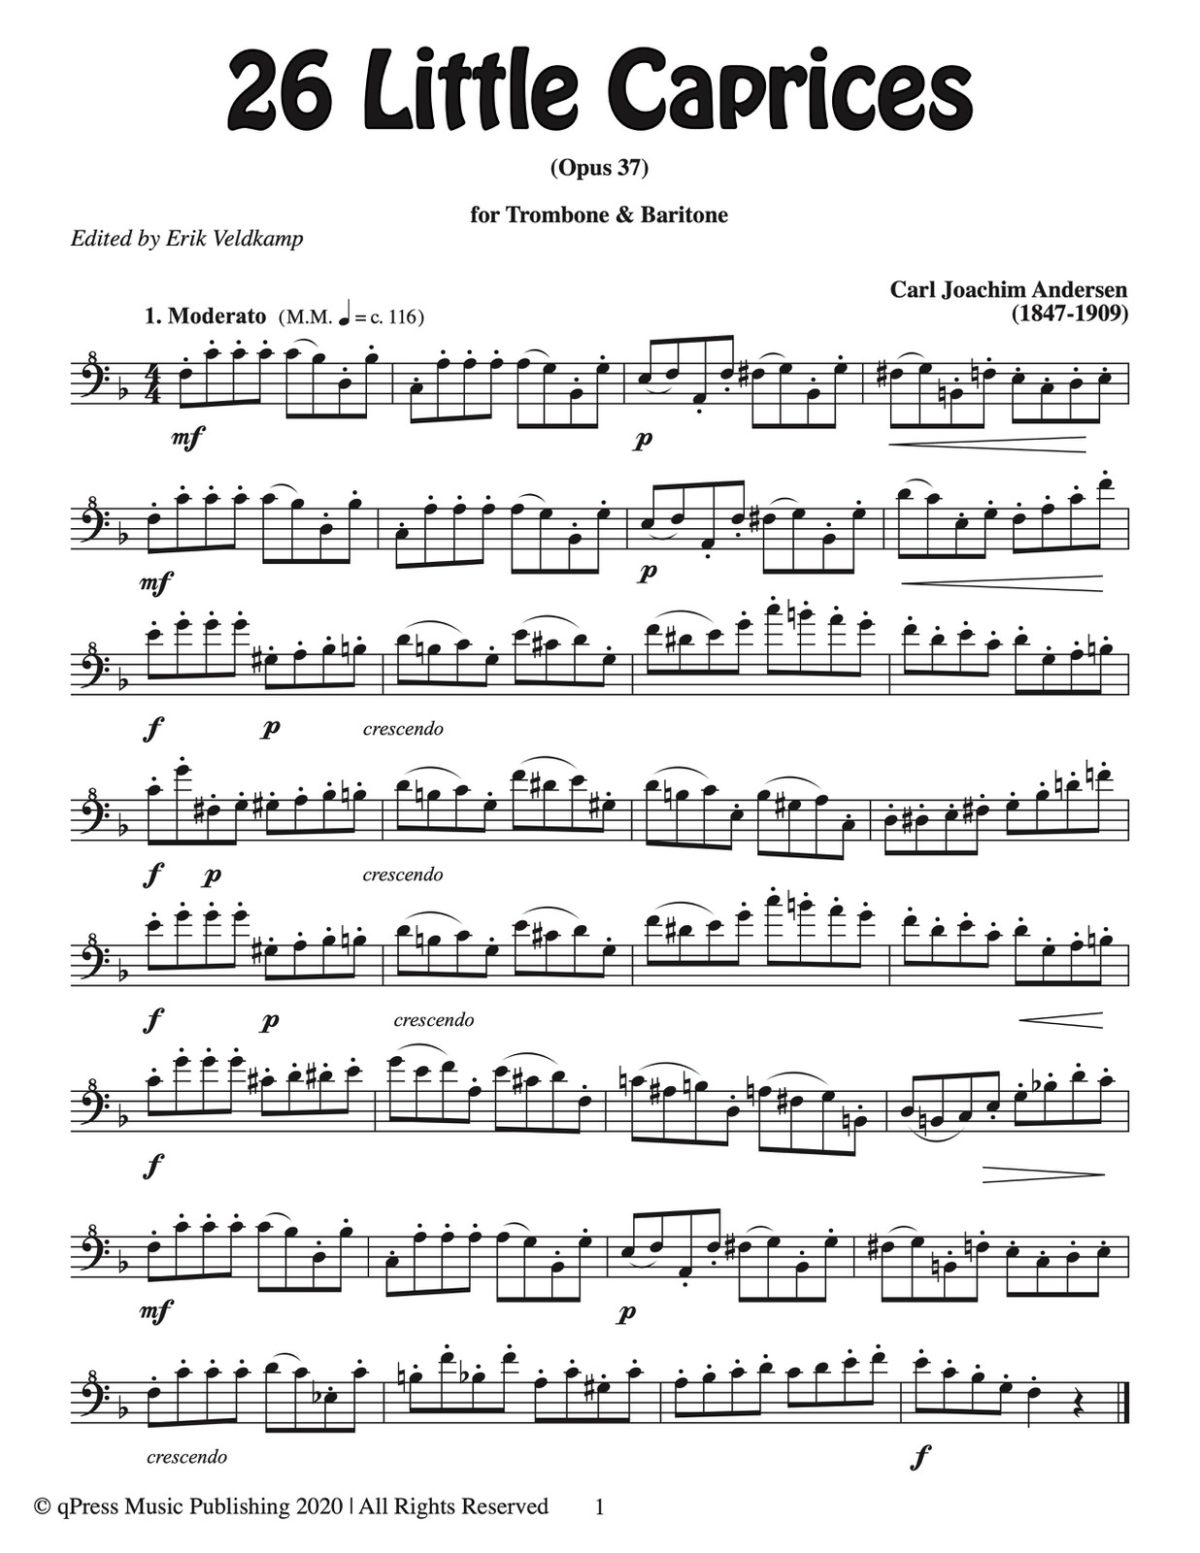 Andersen-Veldkamp, 26 Little Caprices Trombone and Baritone-p03